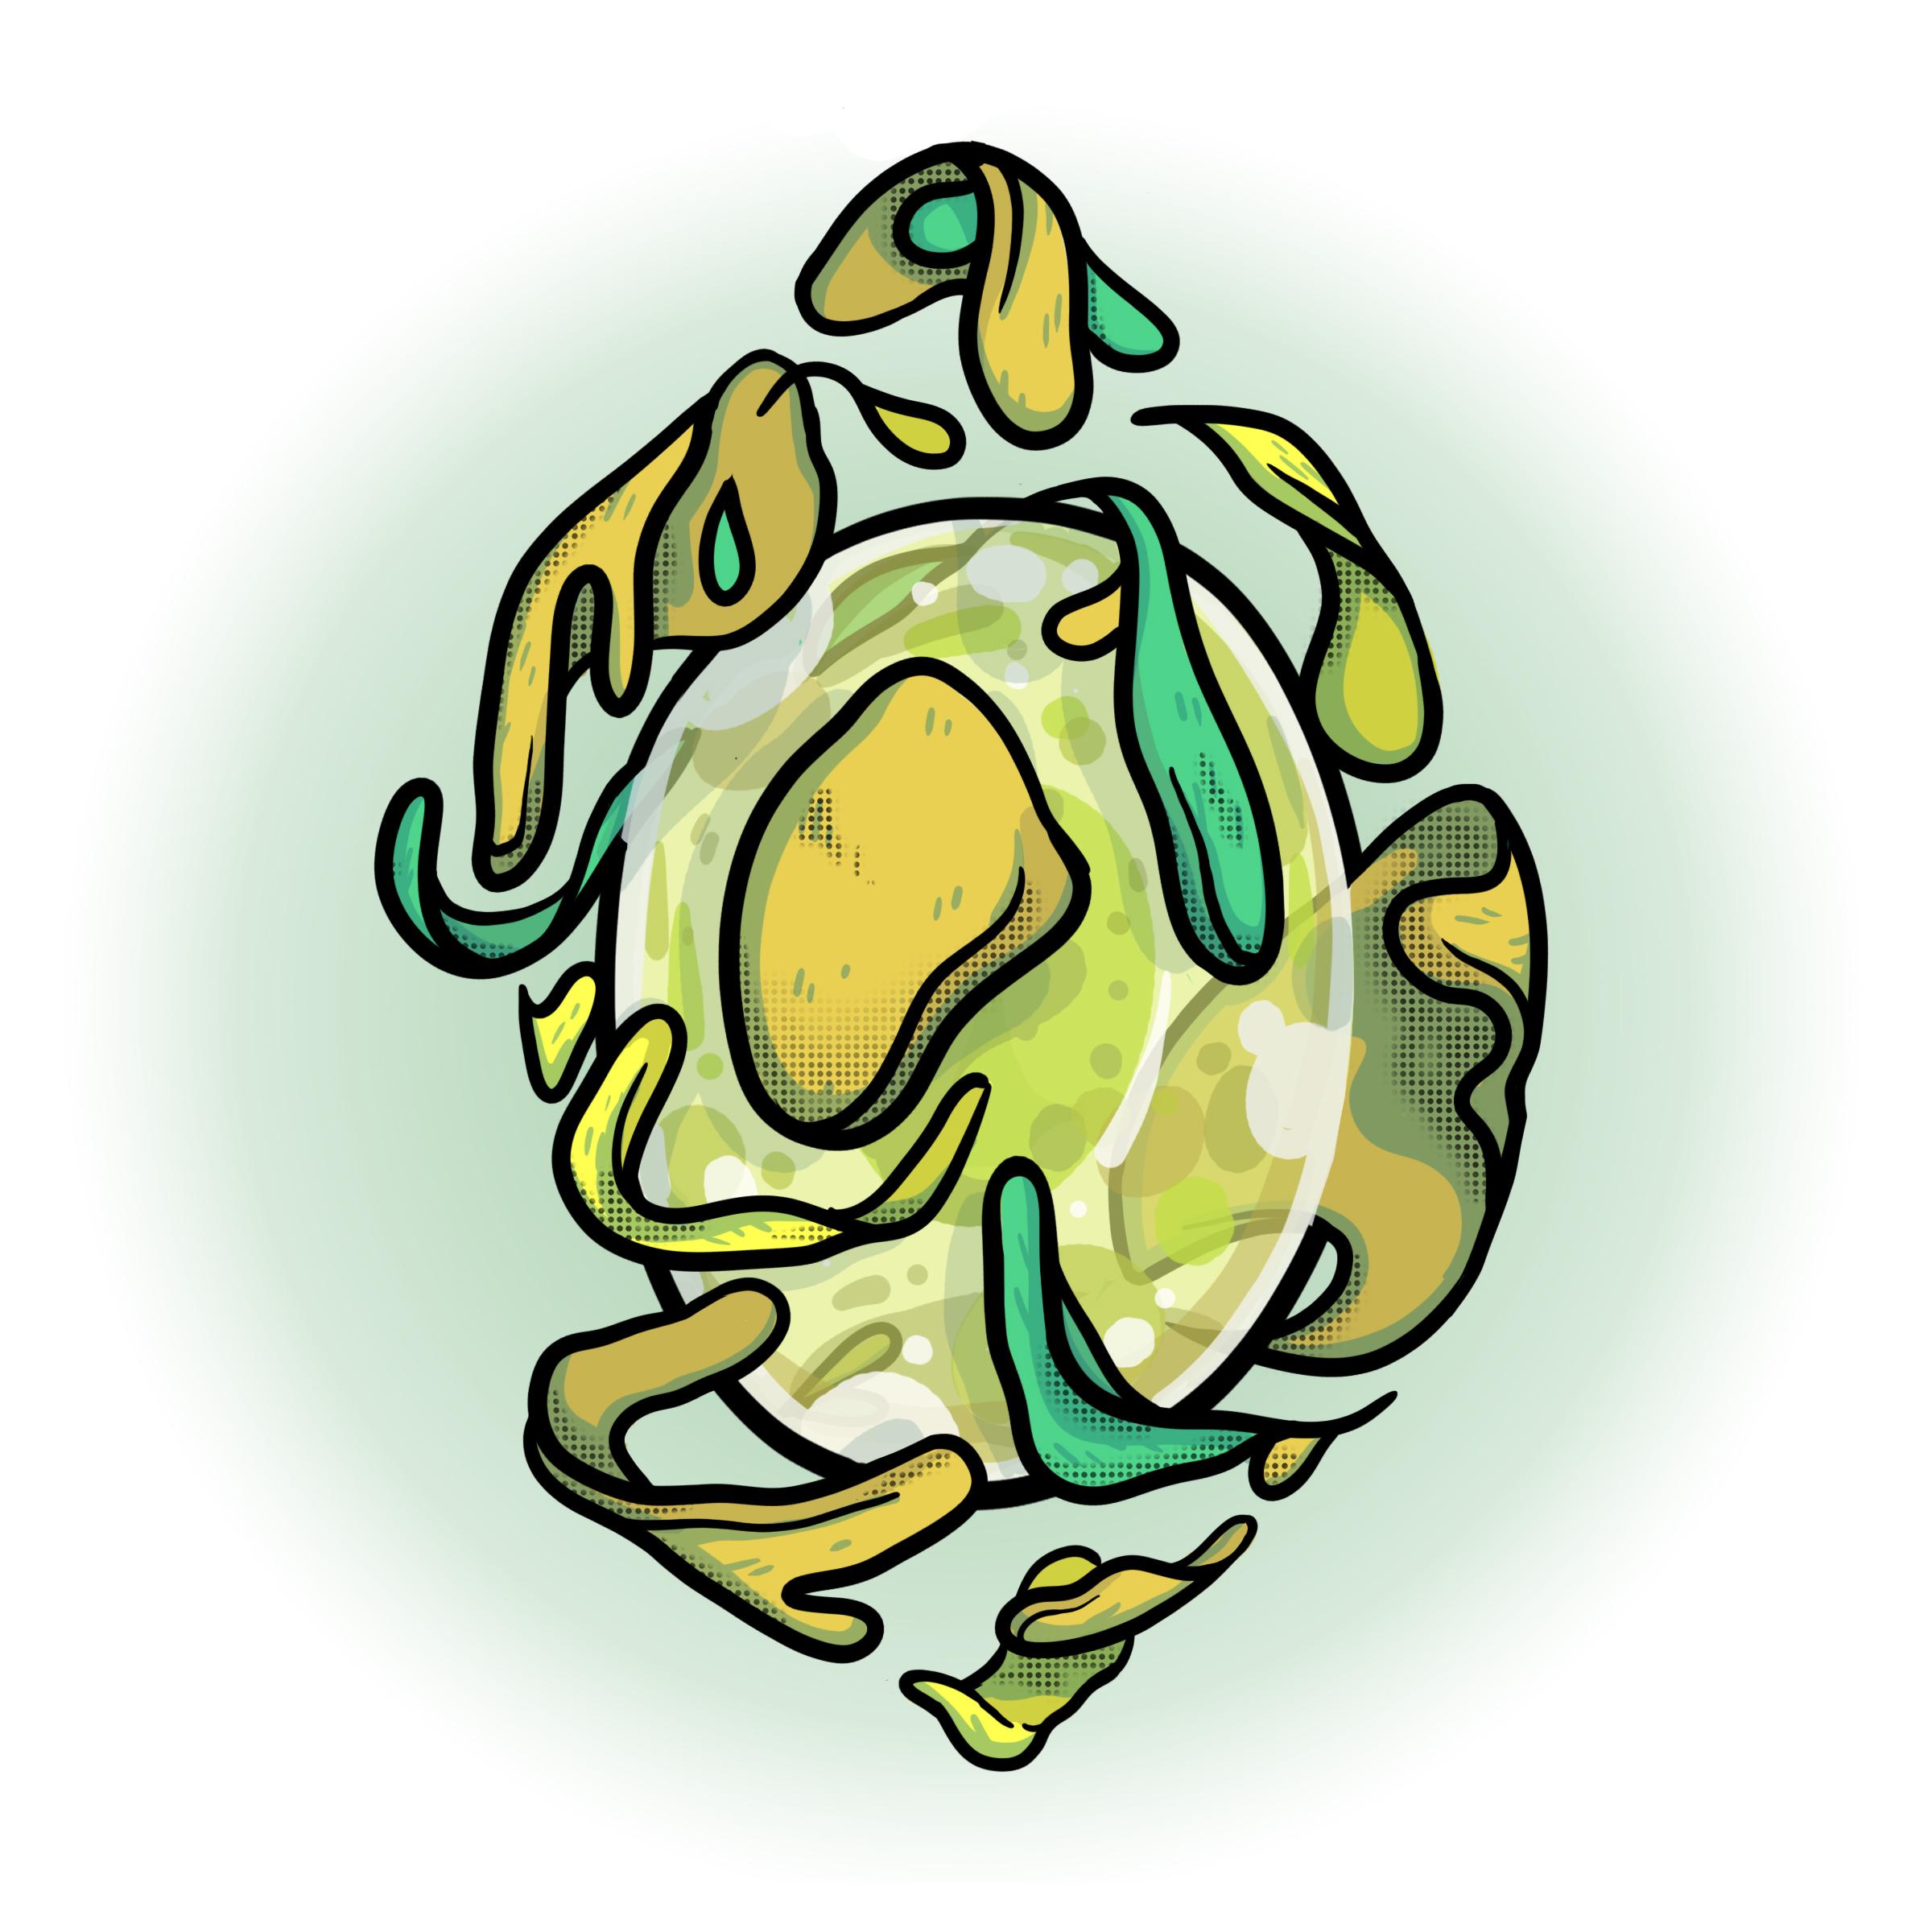 5. Limon